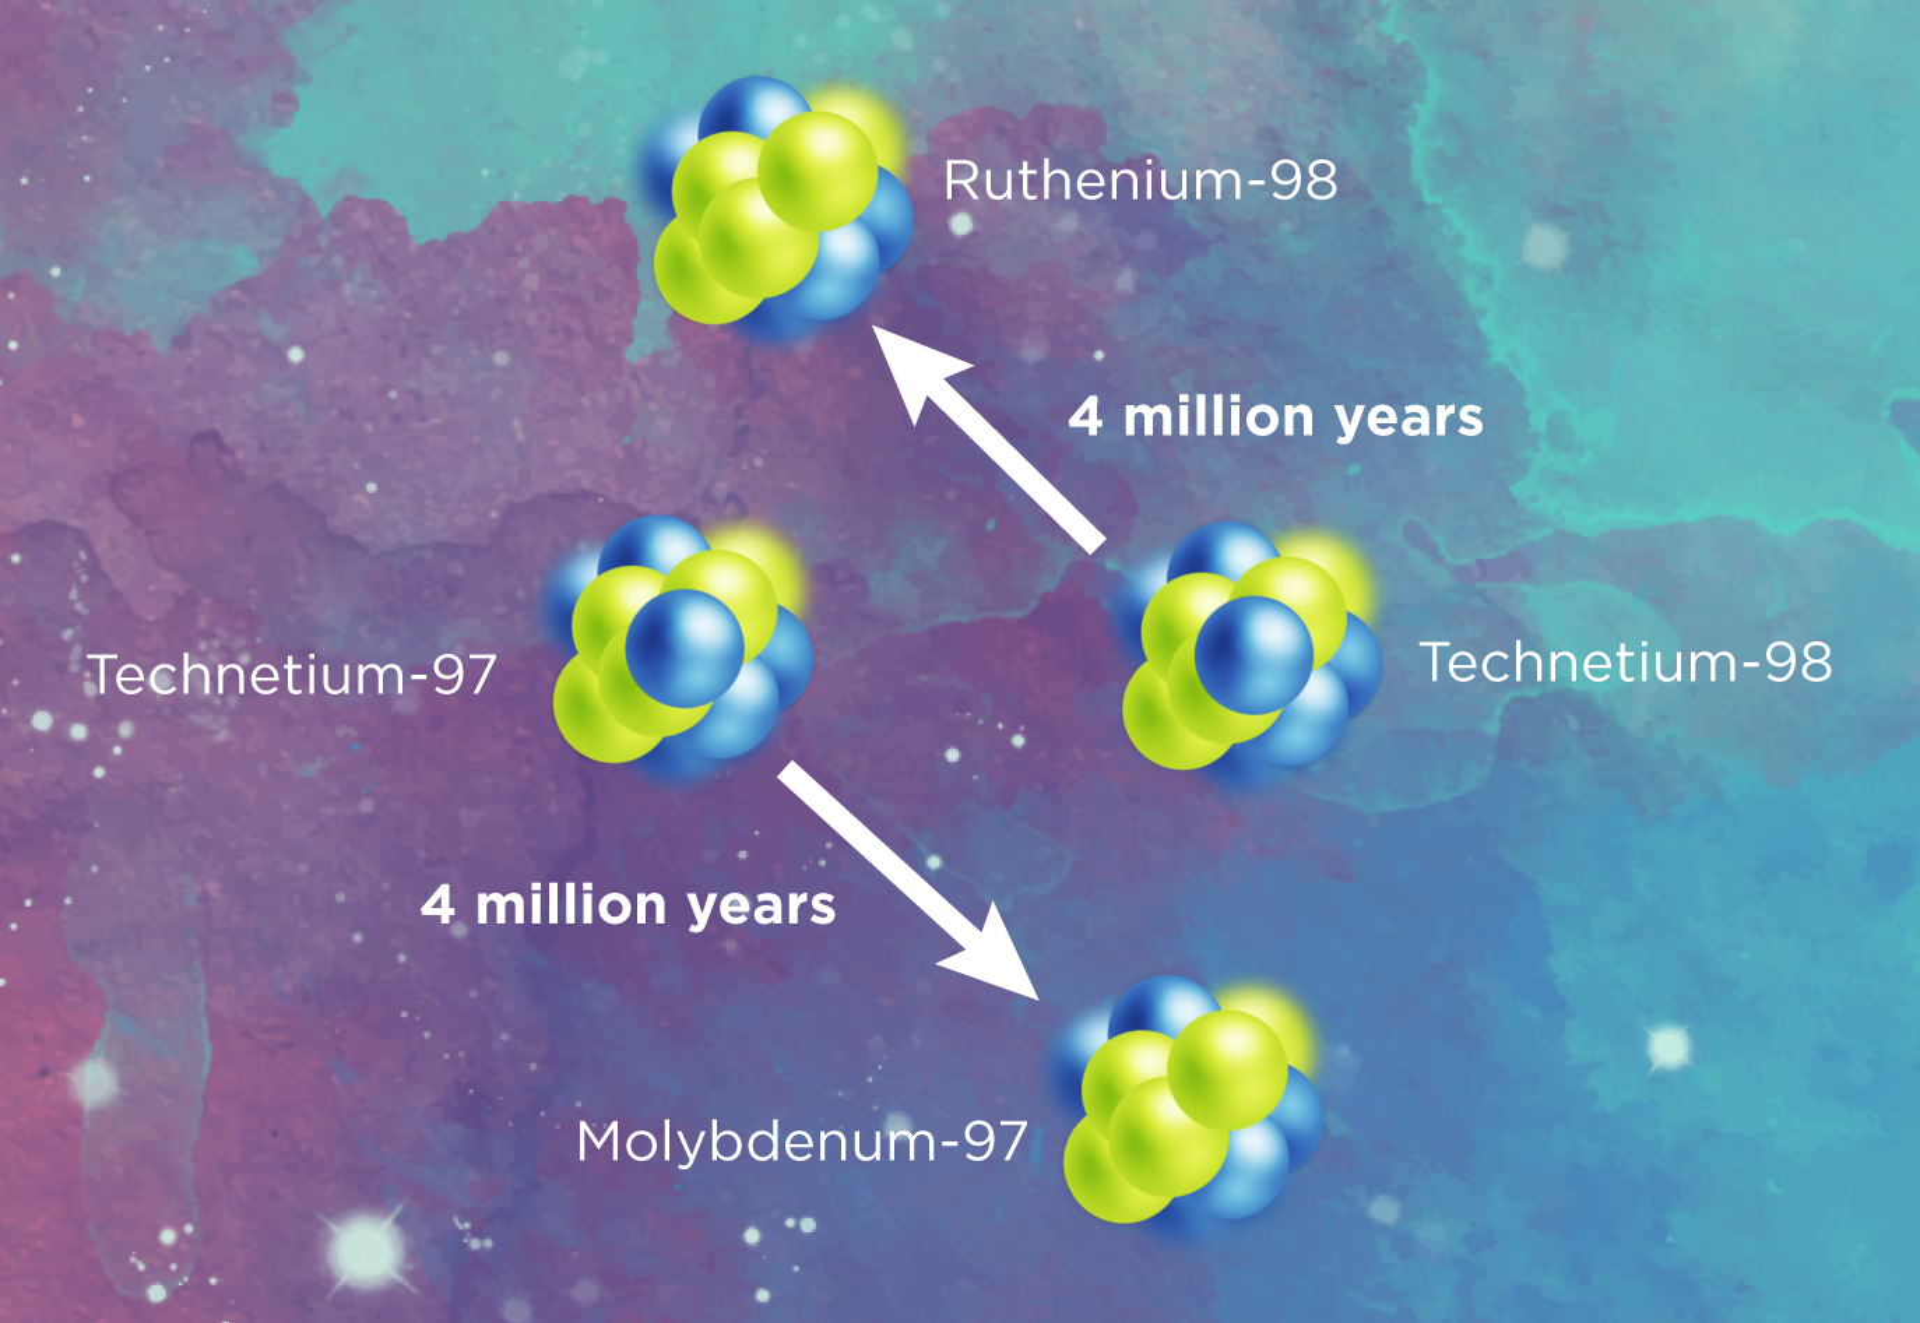 Technetium nuclei. Photo credit Erin O'Donnell, Michigan State